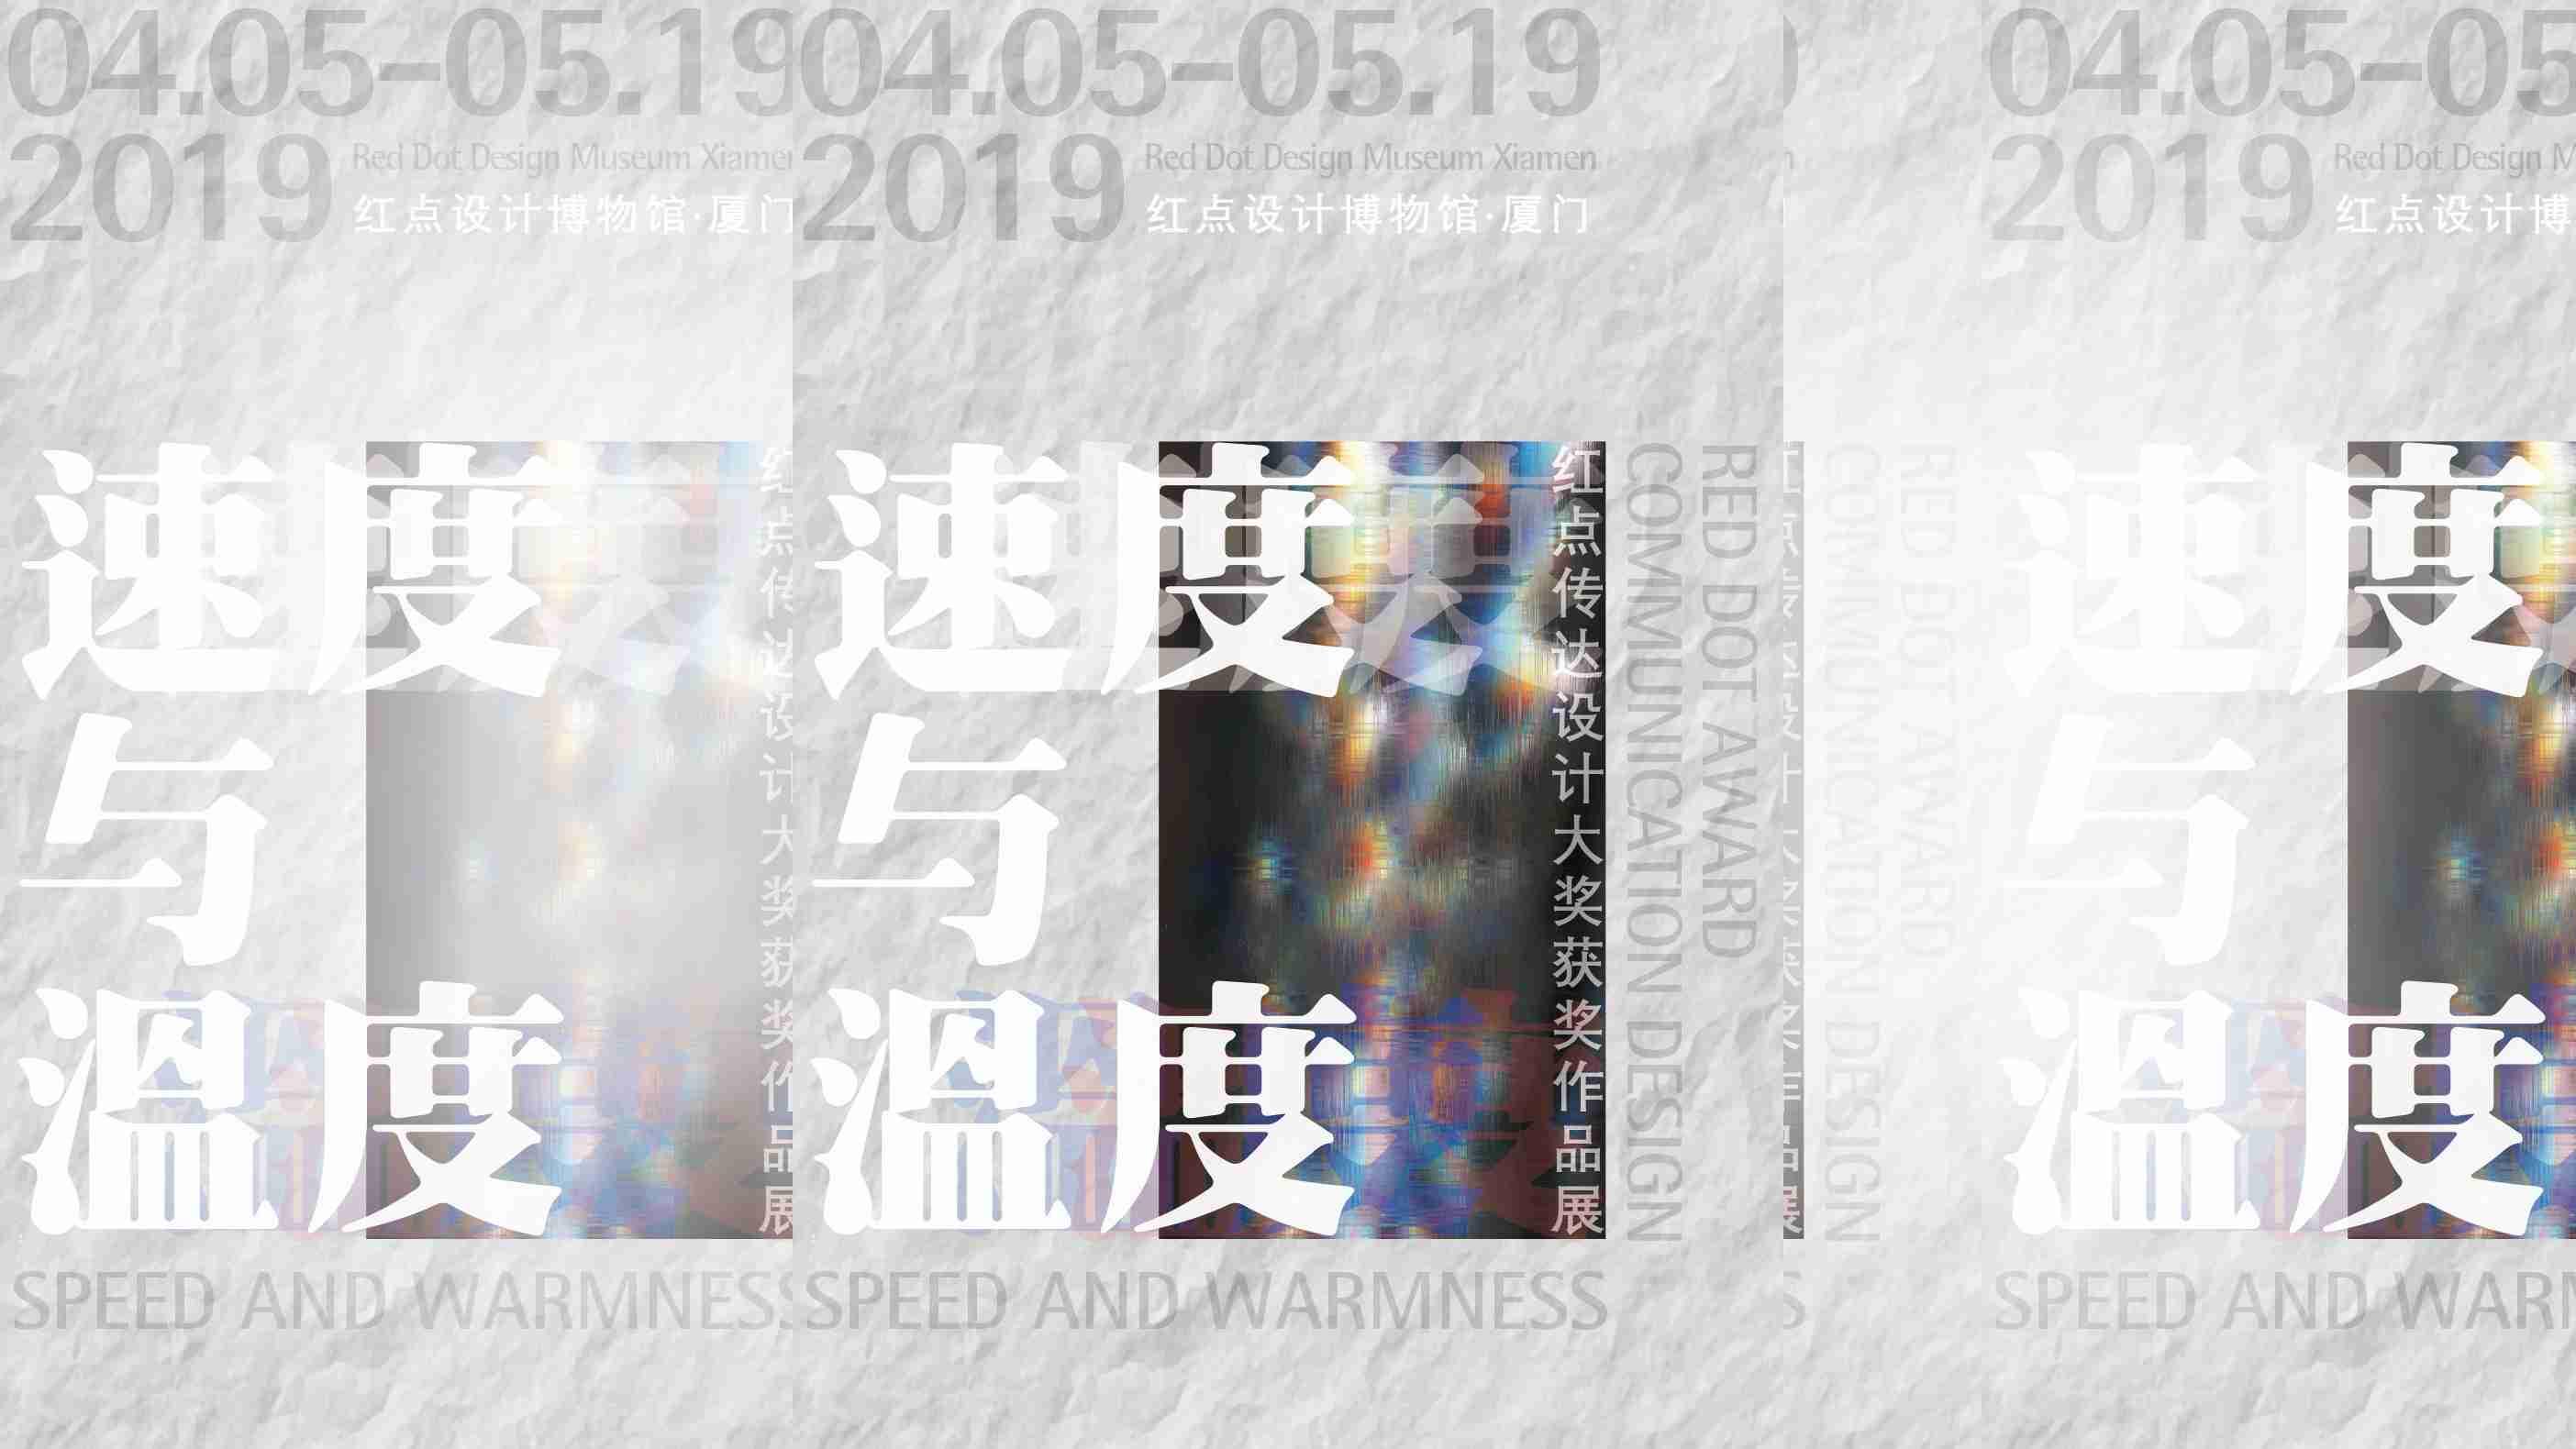 Red Dot Design Museum Xiamen Exhibits Latest Award Winning Designs Cgtn